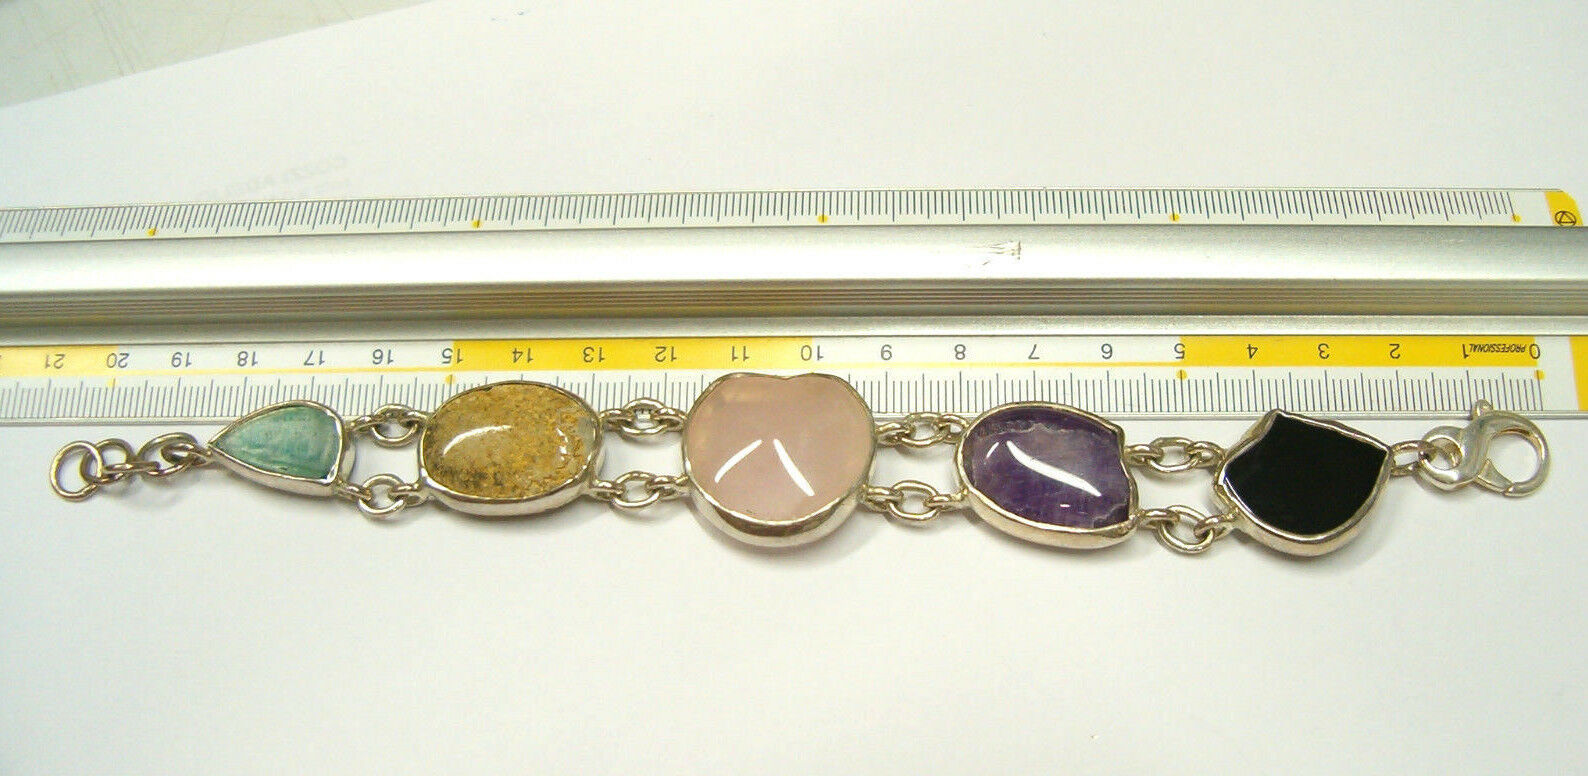 Bracciale in argentoo 925 con Pietre Dure naturali naturali naturali - Ametista Quarzo rosa Agata cd63ec